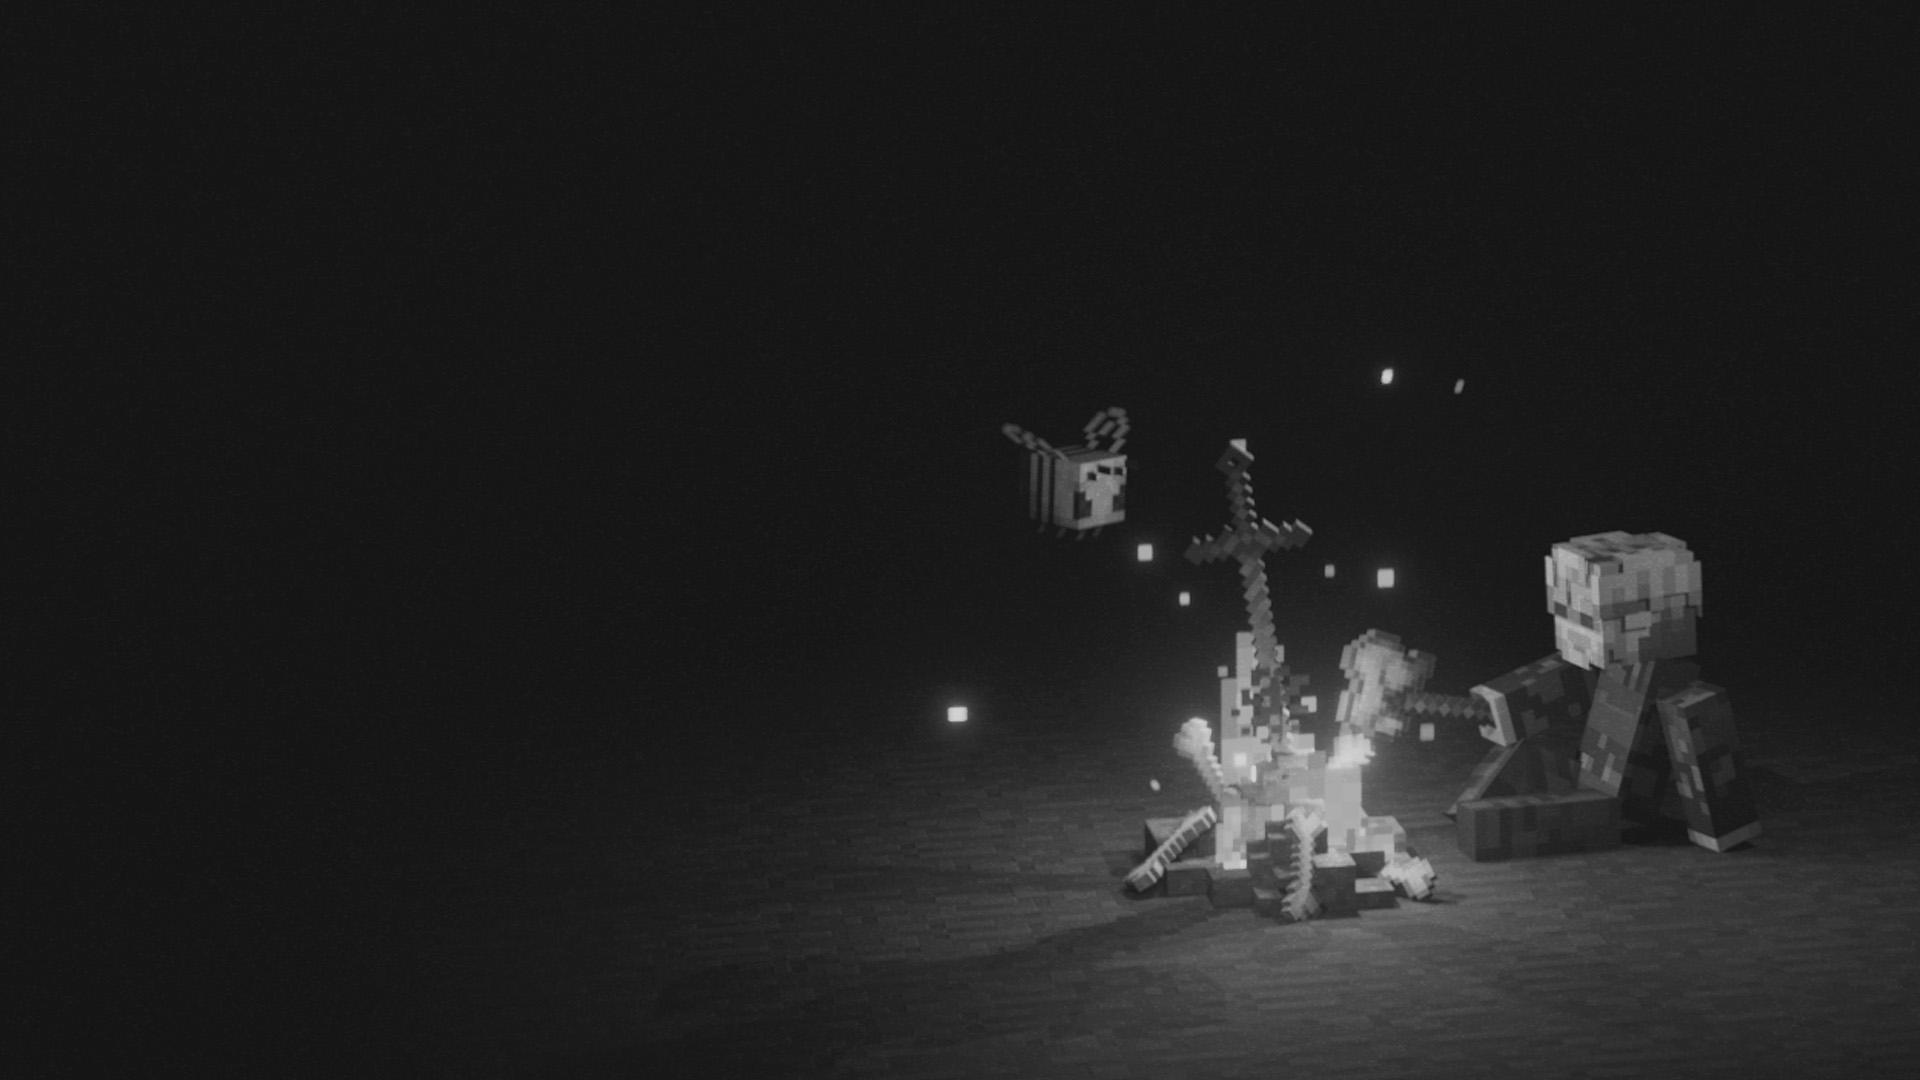 pewdiepie intro banner black and white minecraft fireplace poppip